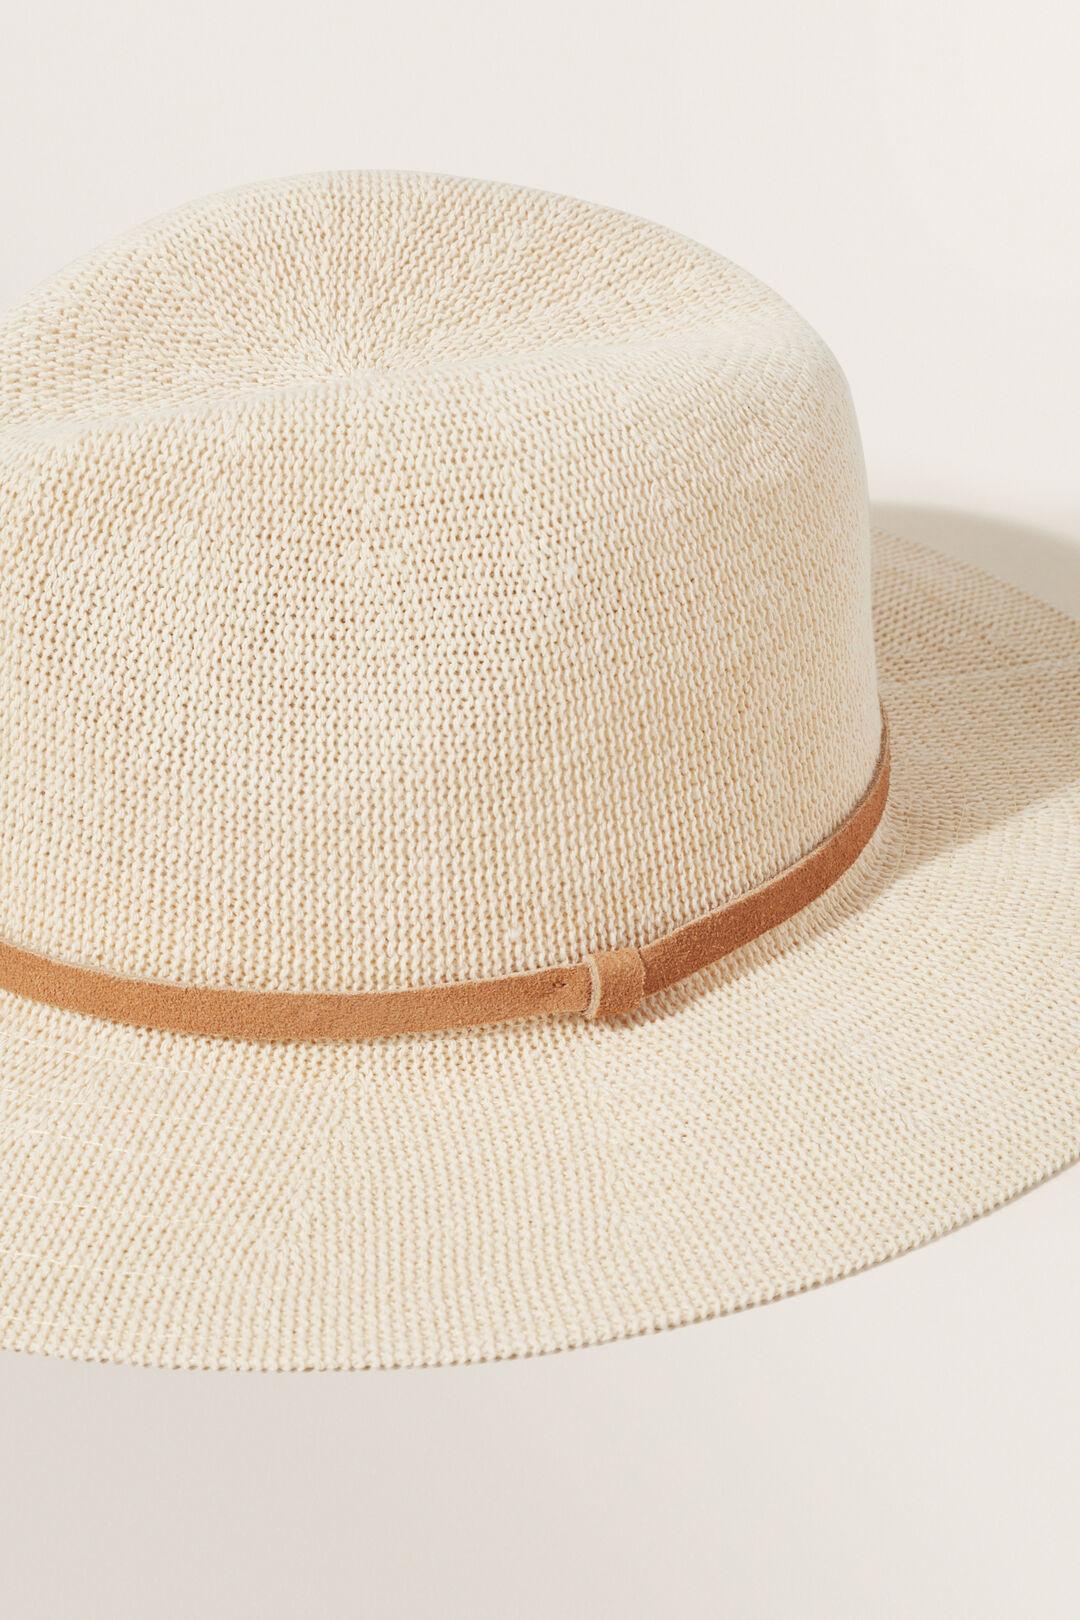 Lightweight Panama Hat  NATURAL/ TAN  hi-res